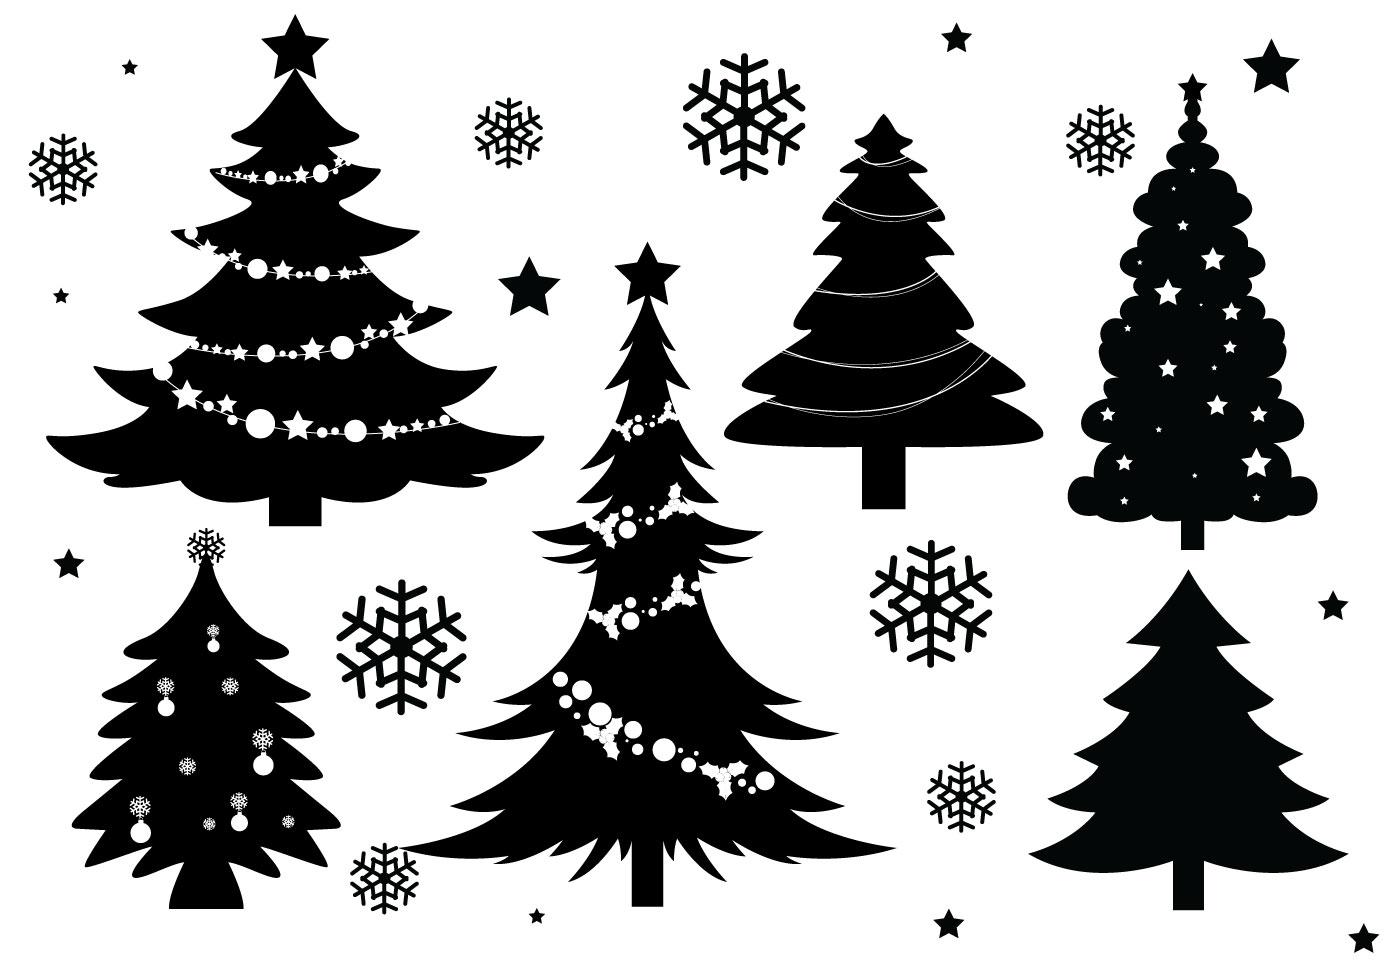 Christmas Tree Silhouette Vectors